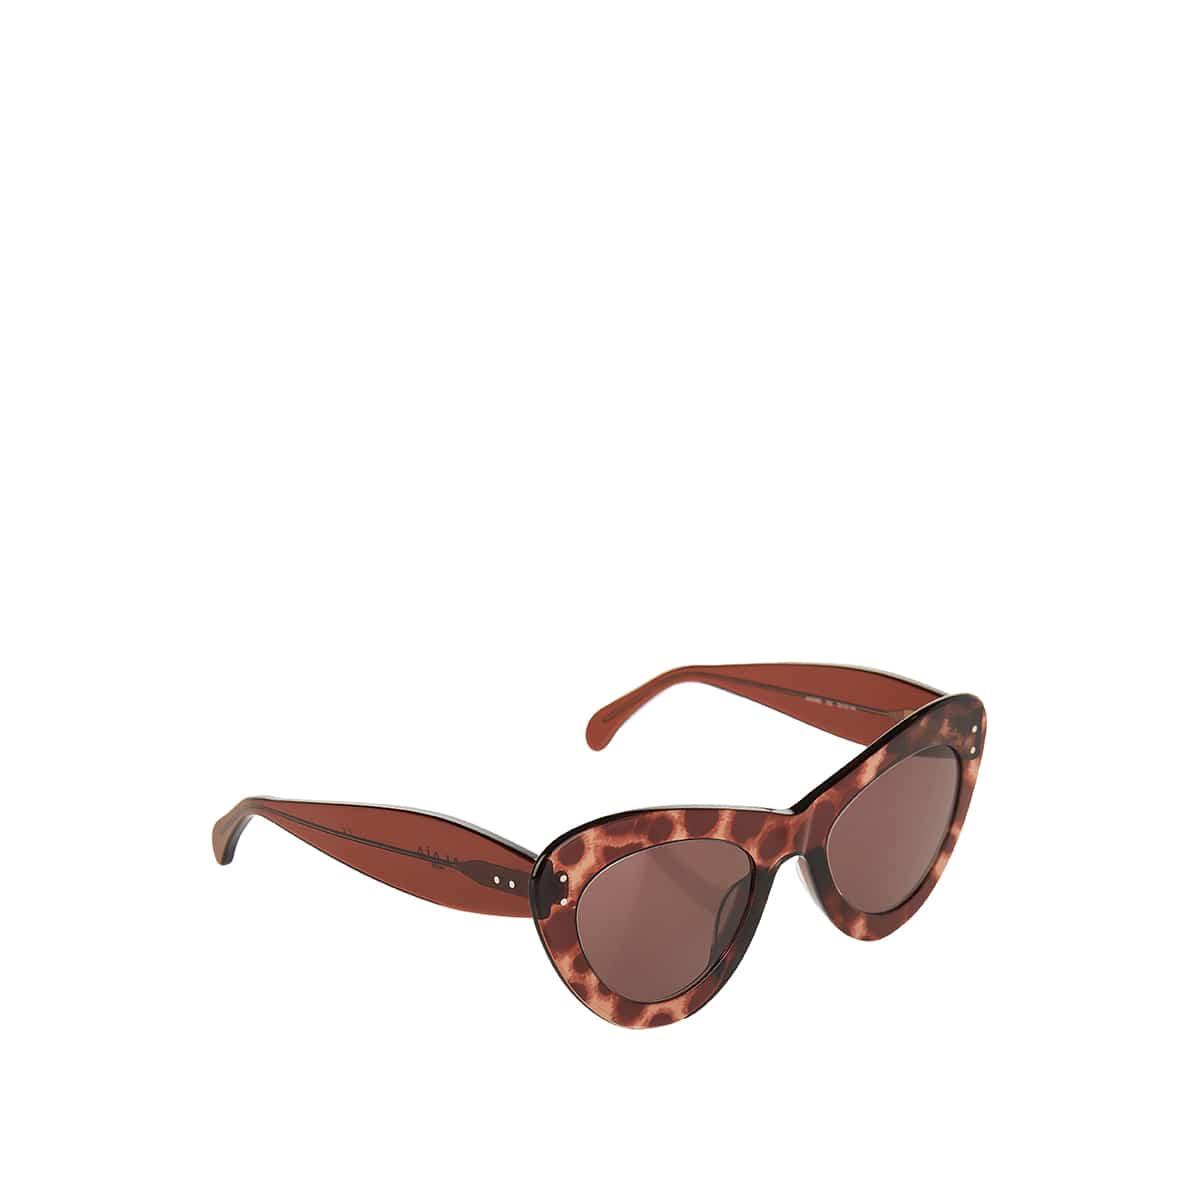 Leopard print acetate sunglasses